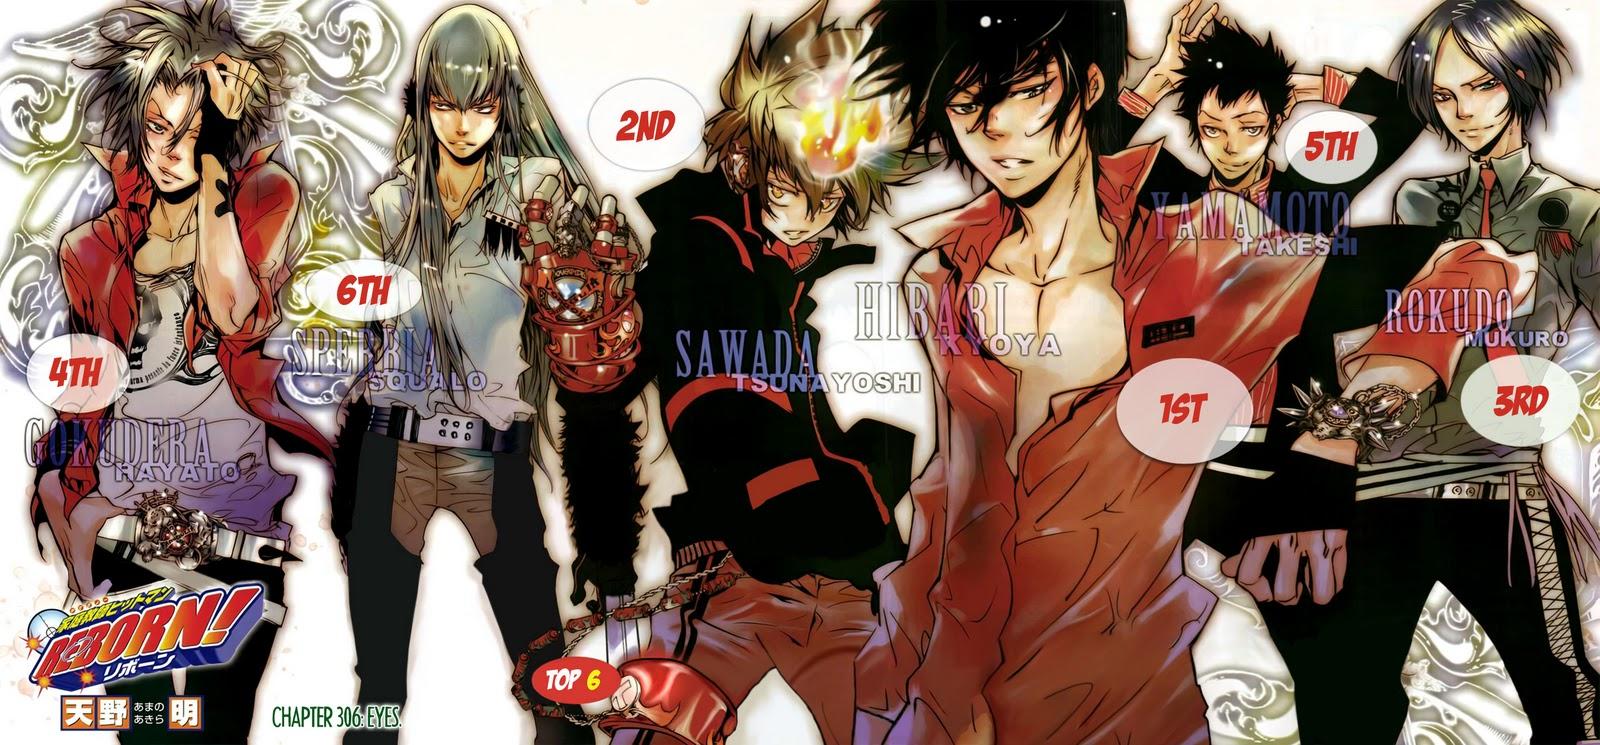 Katekyo hitman reborn wallpapers anime wallpapers voltagebd Gallery